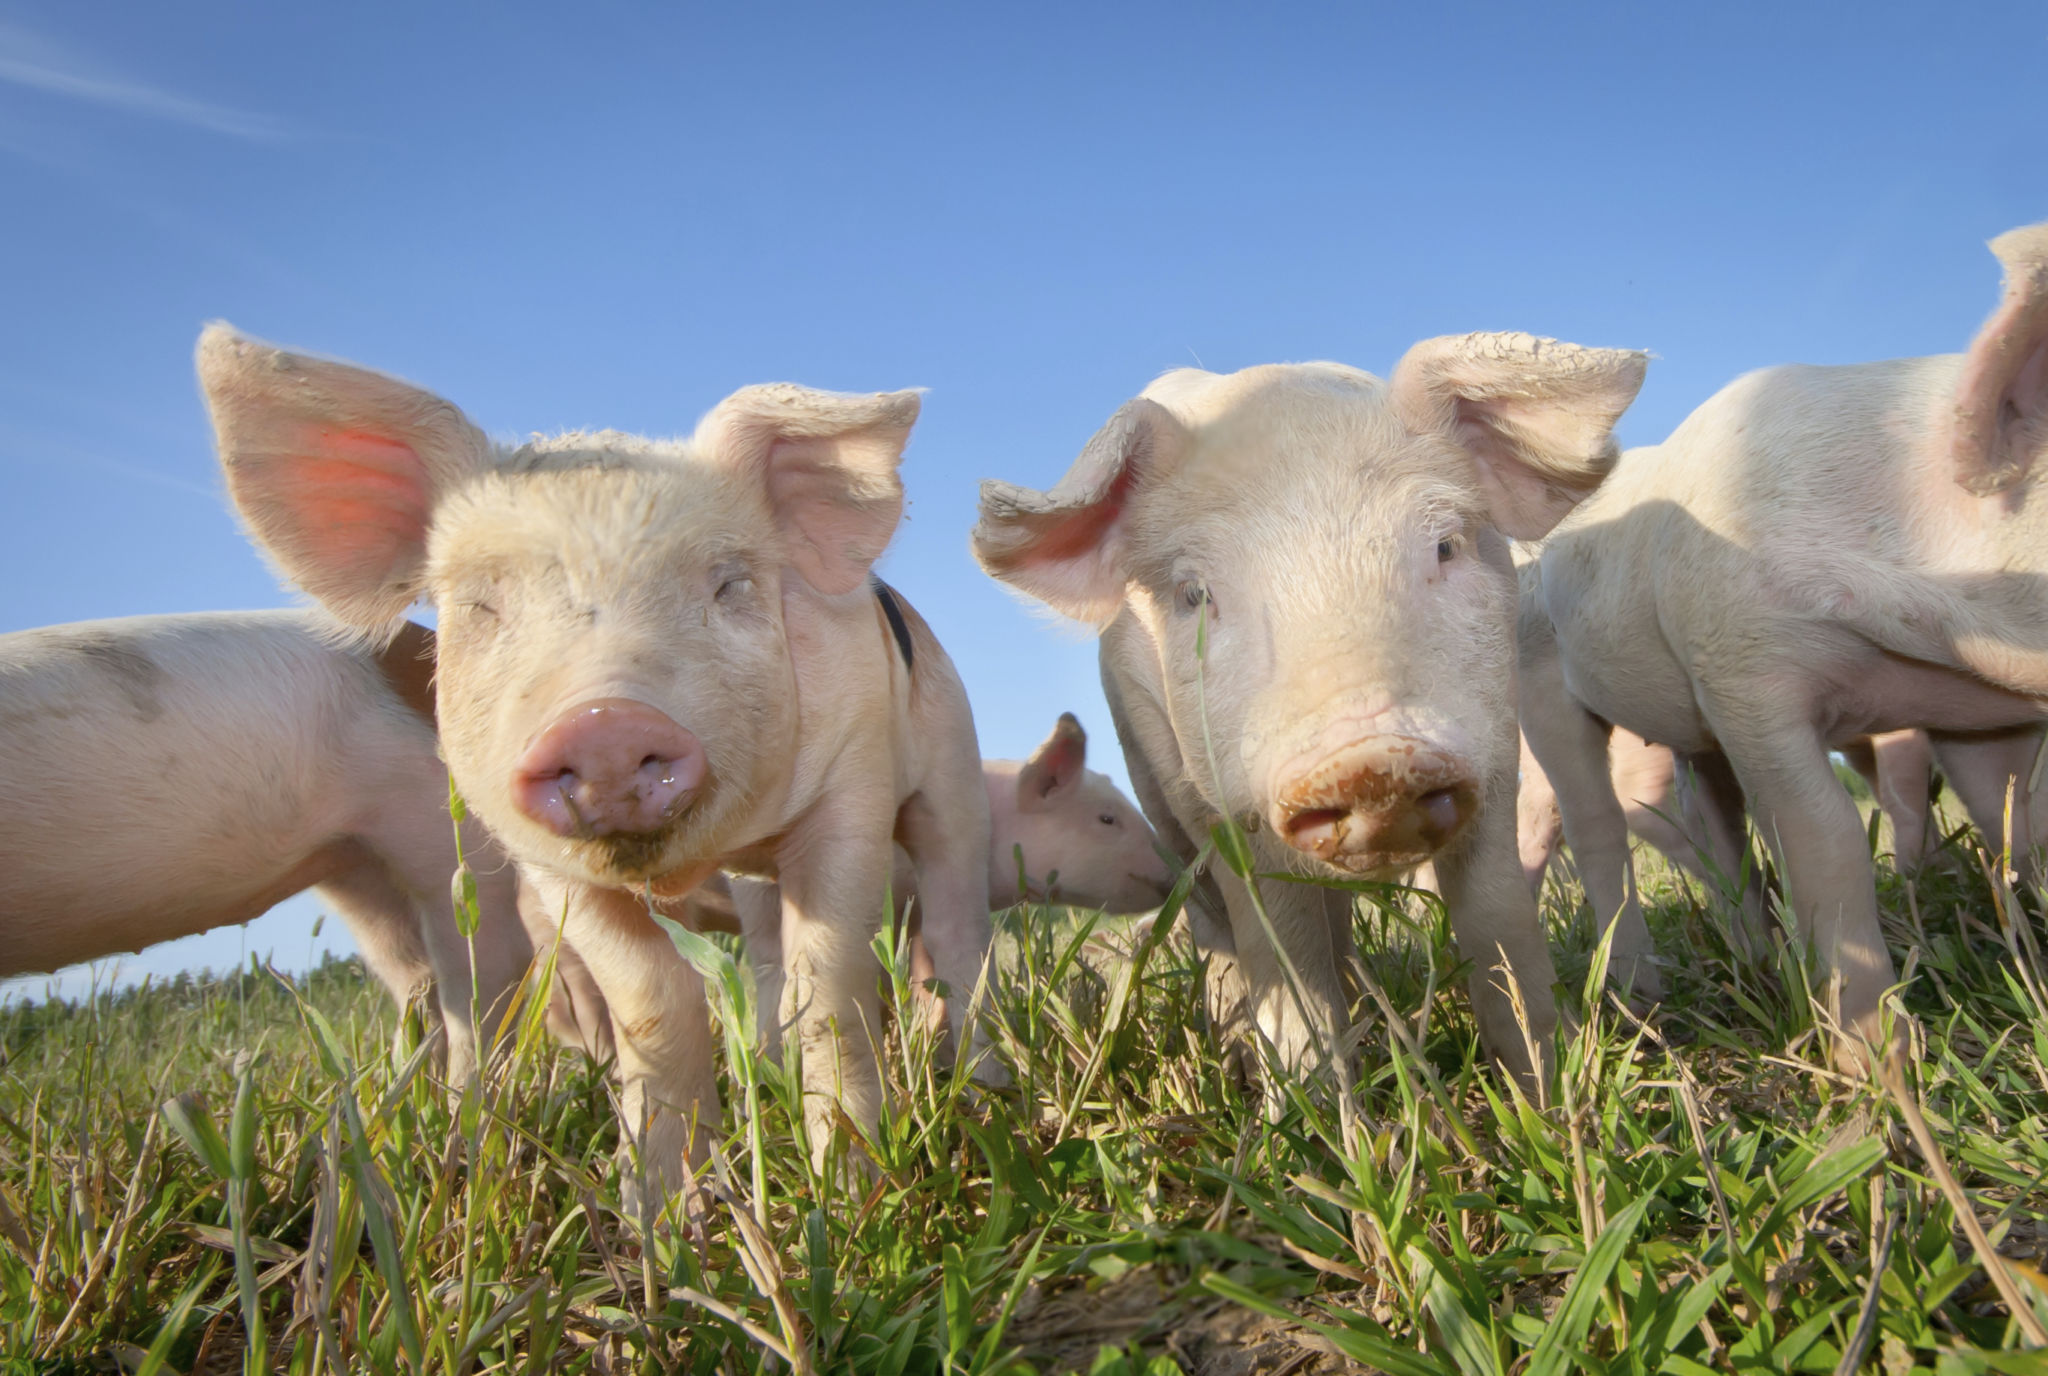 Two cute pigs on a pigfarm outdoors